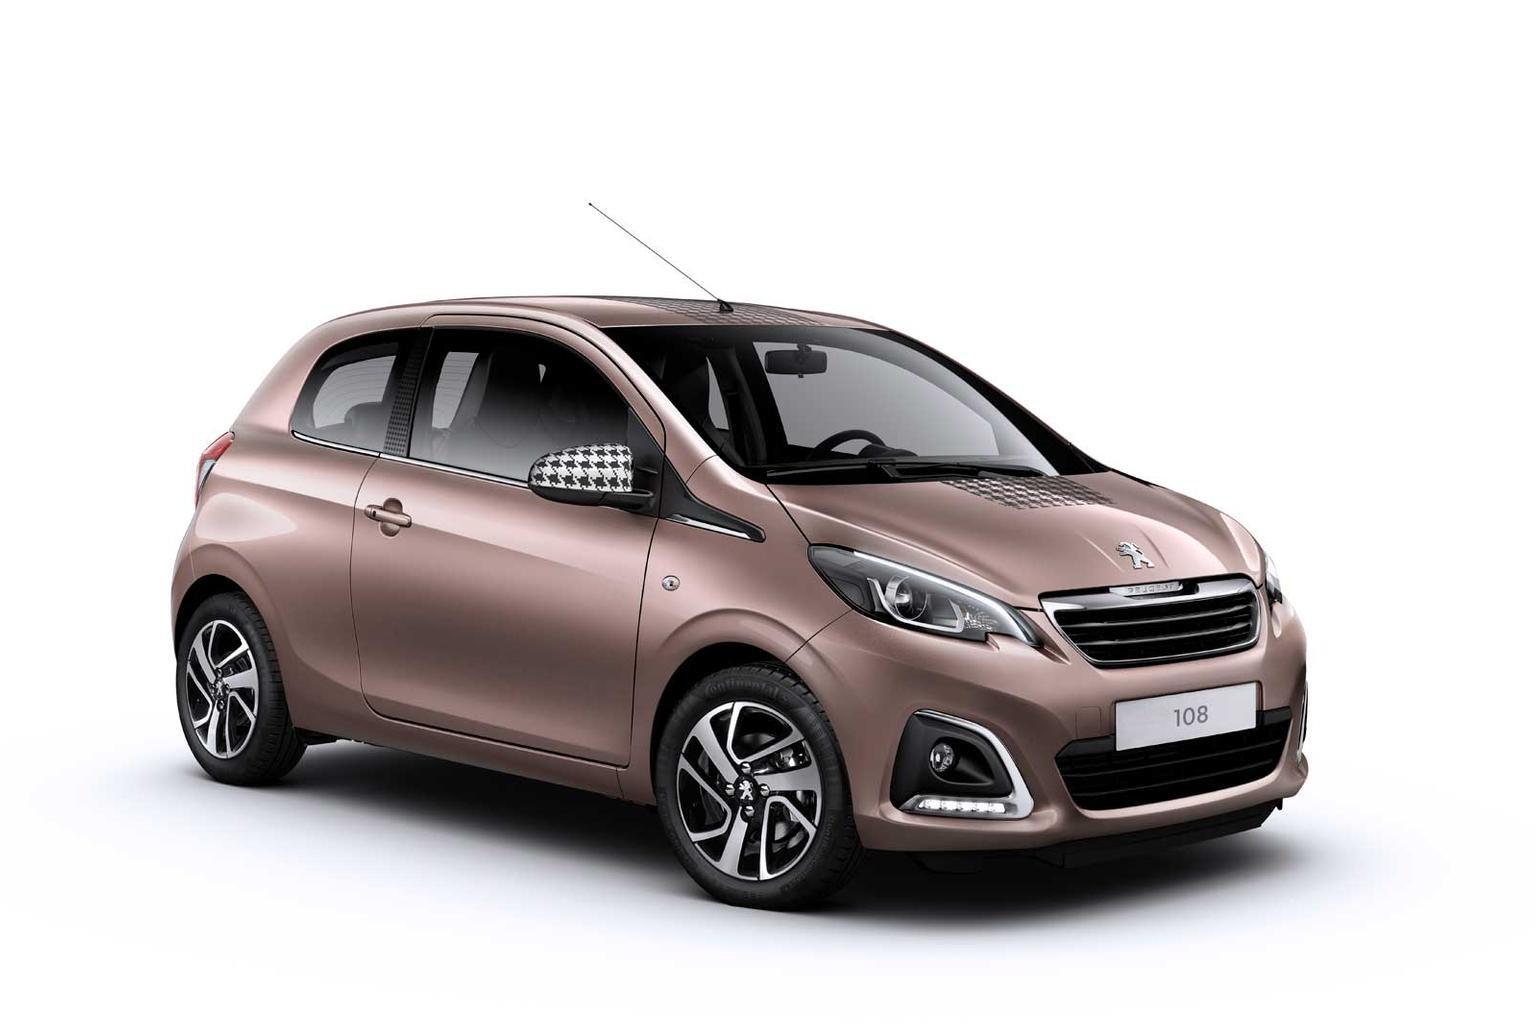 2014 Peugeot 108 revealed